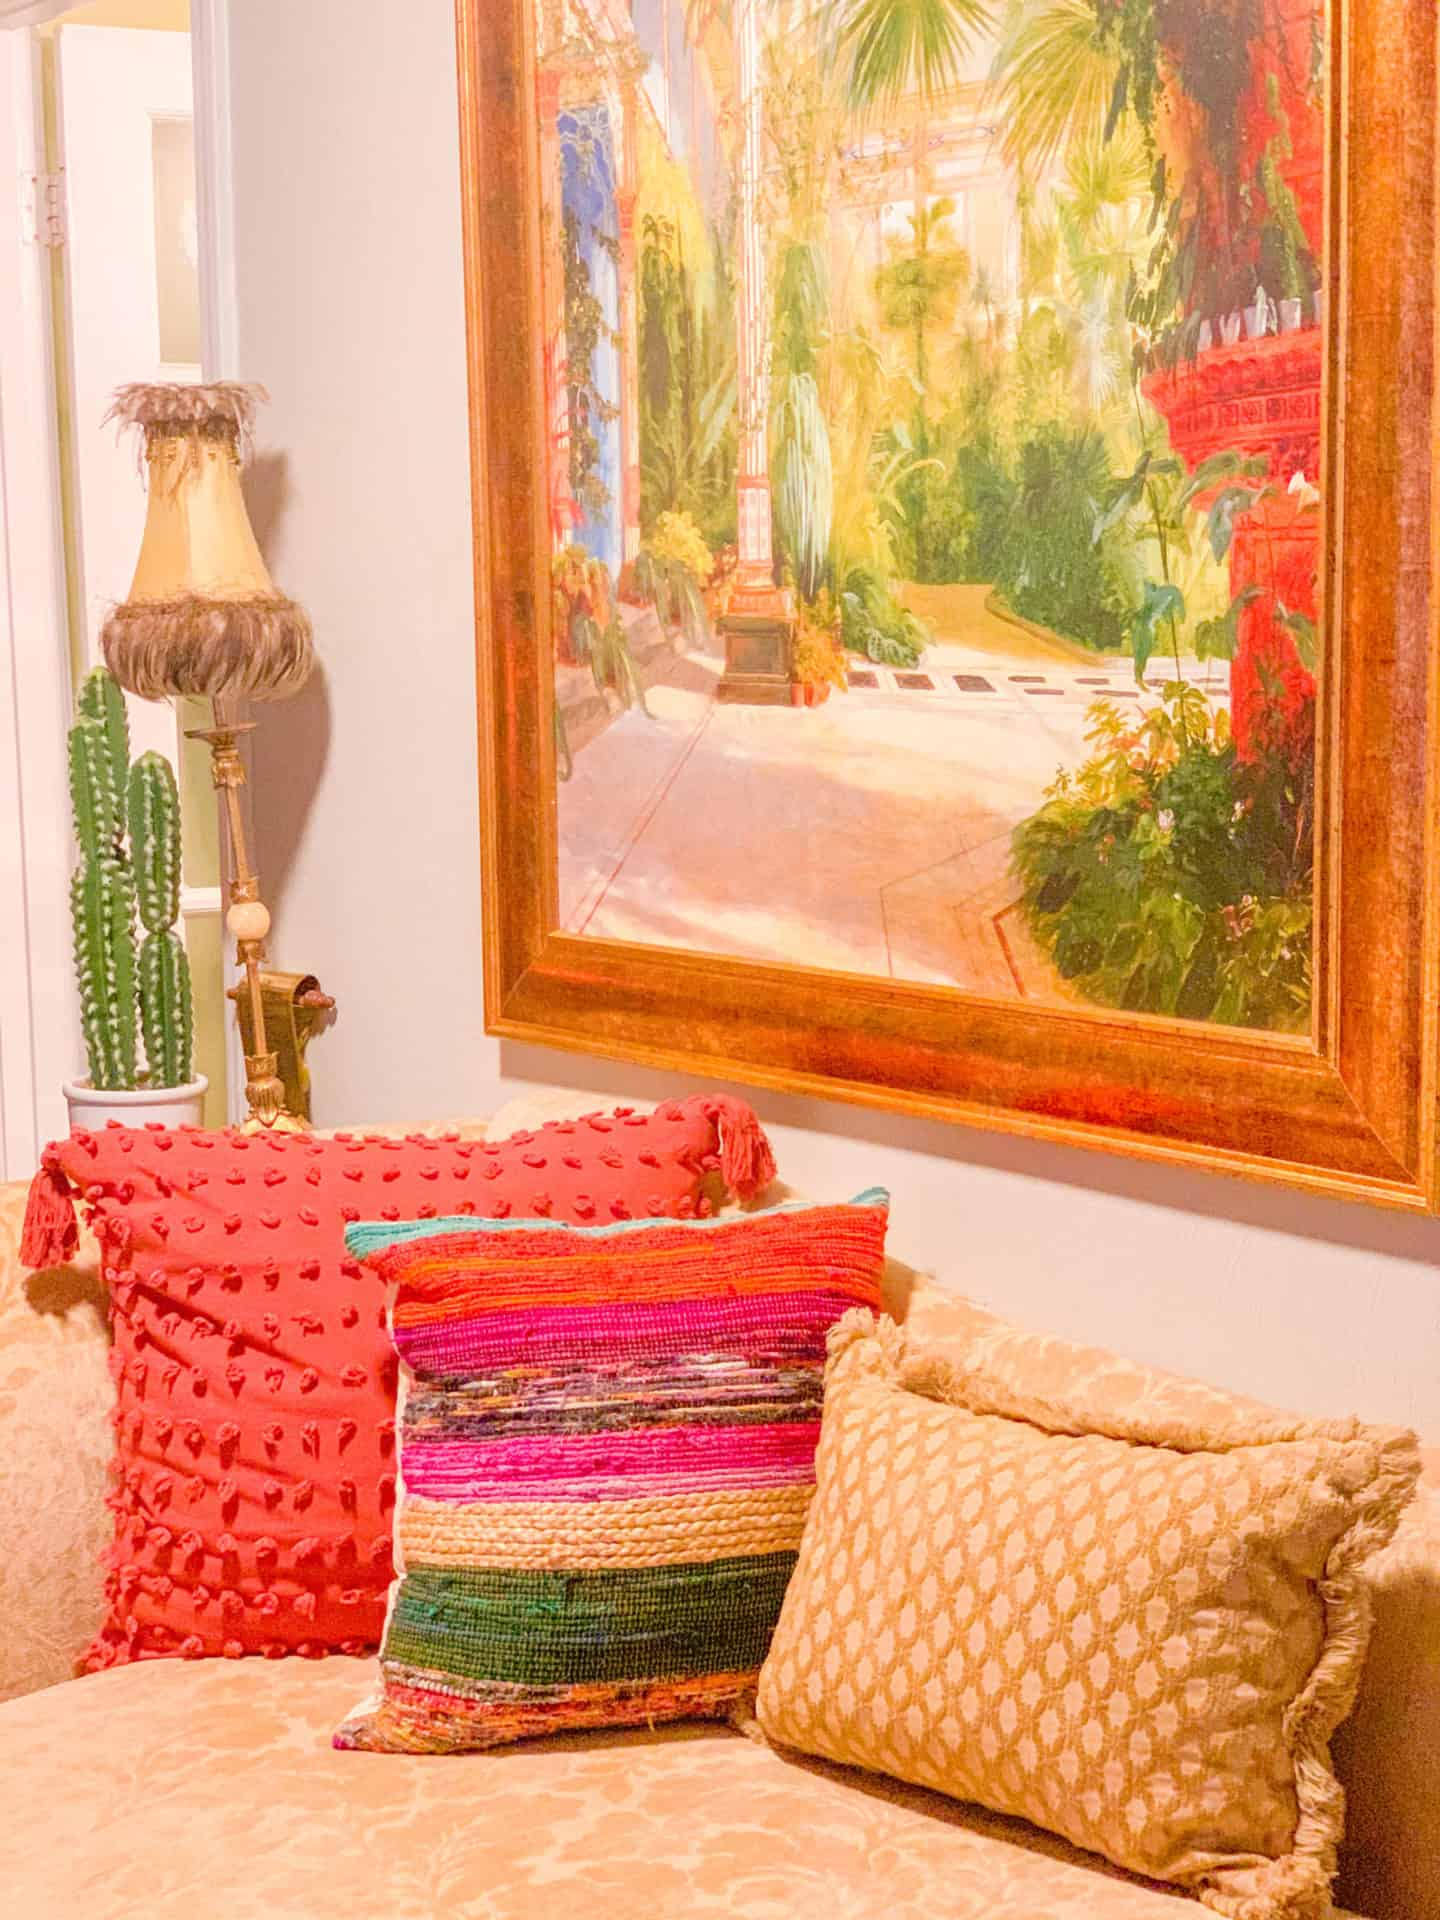 How To Boho Chic Bedroom Decor